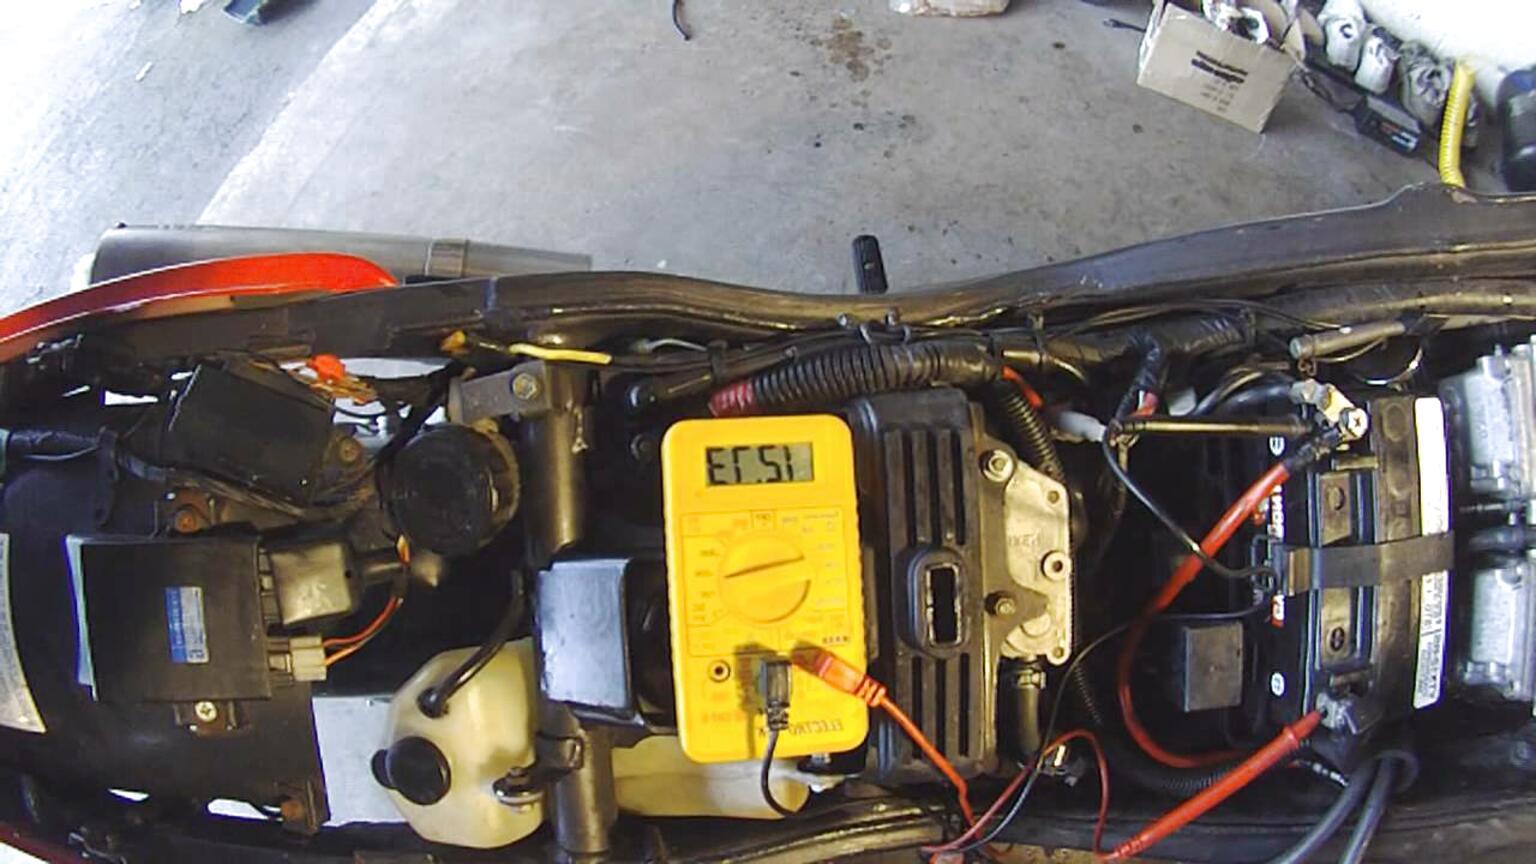 tdm 850 batteria usato